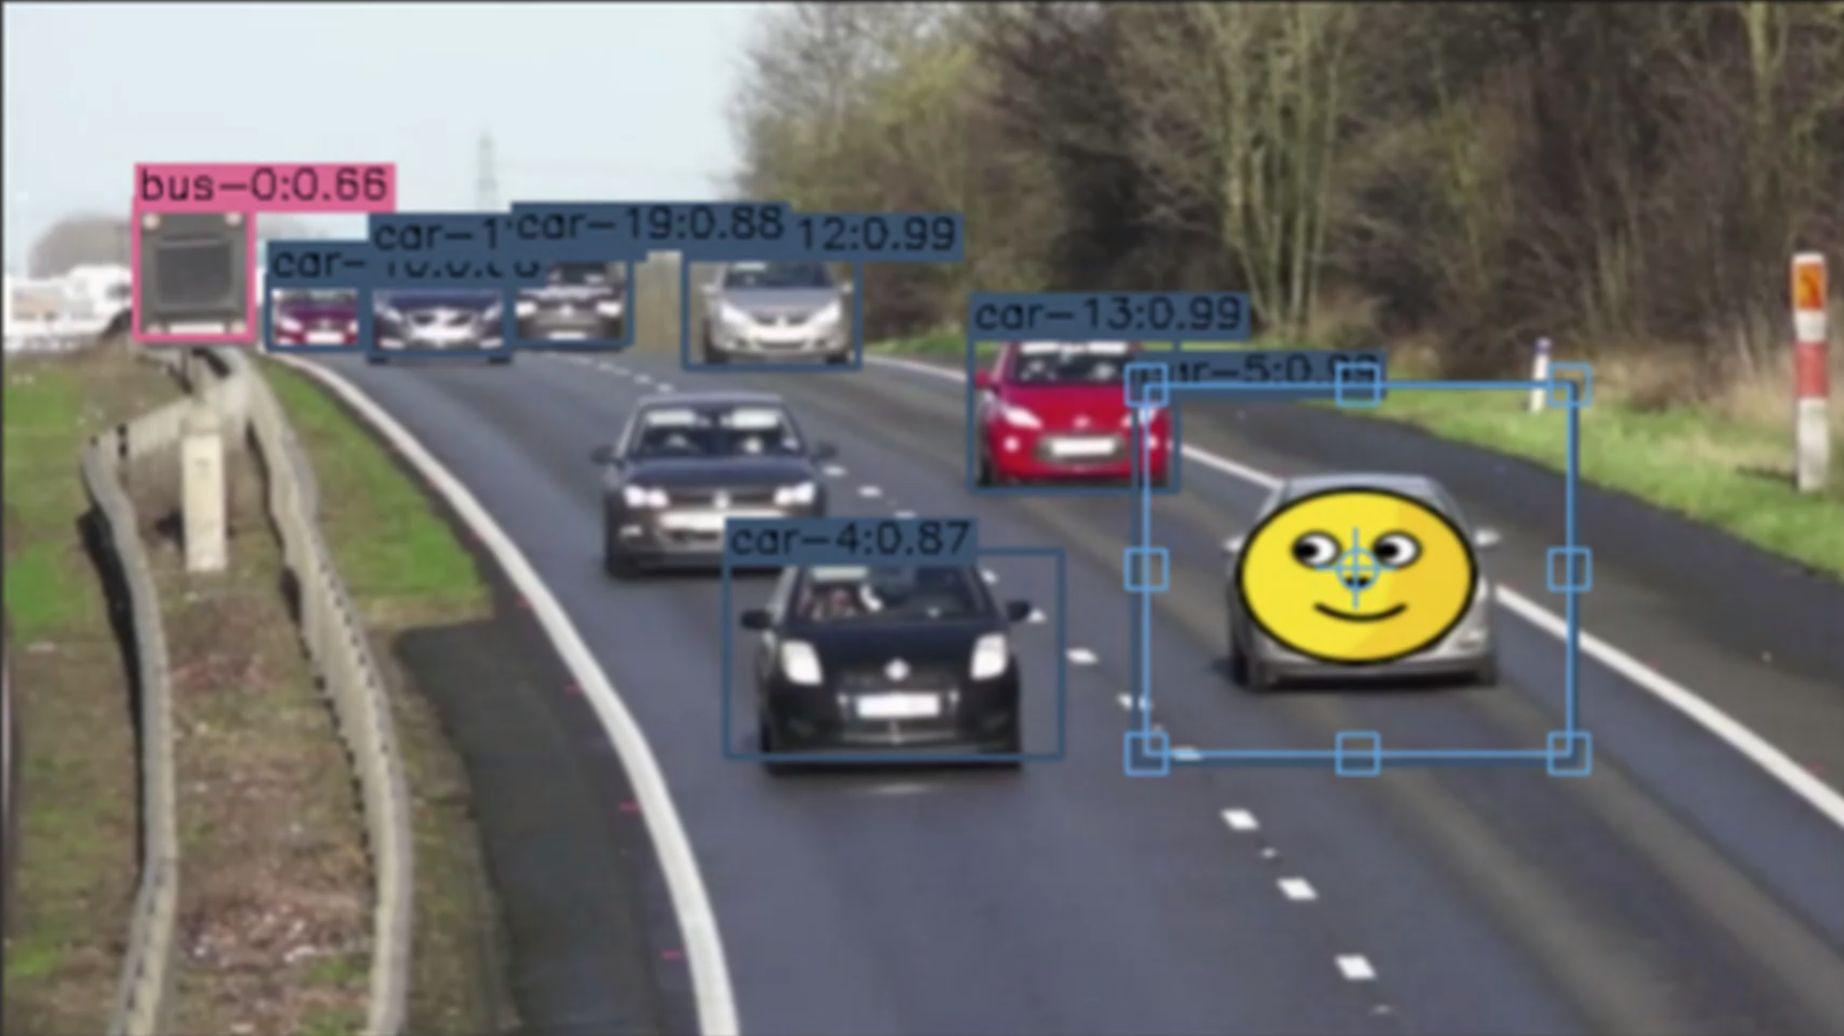 Detección de objetos con inteligencia artificial en OpenShot 2.6